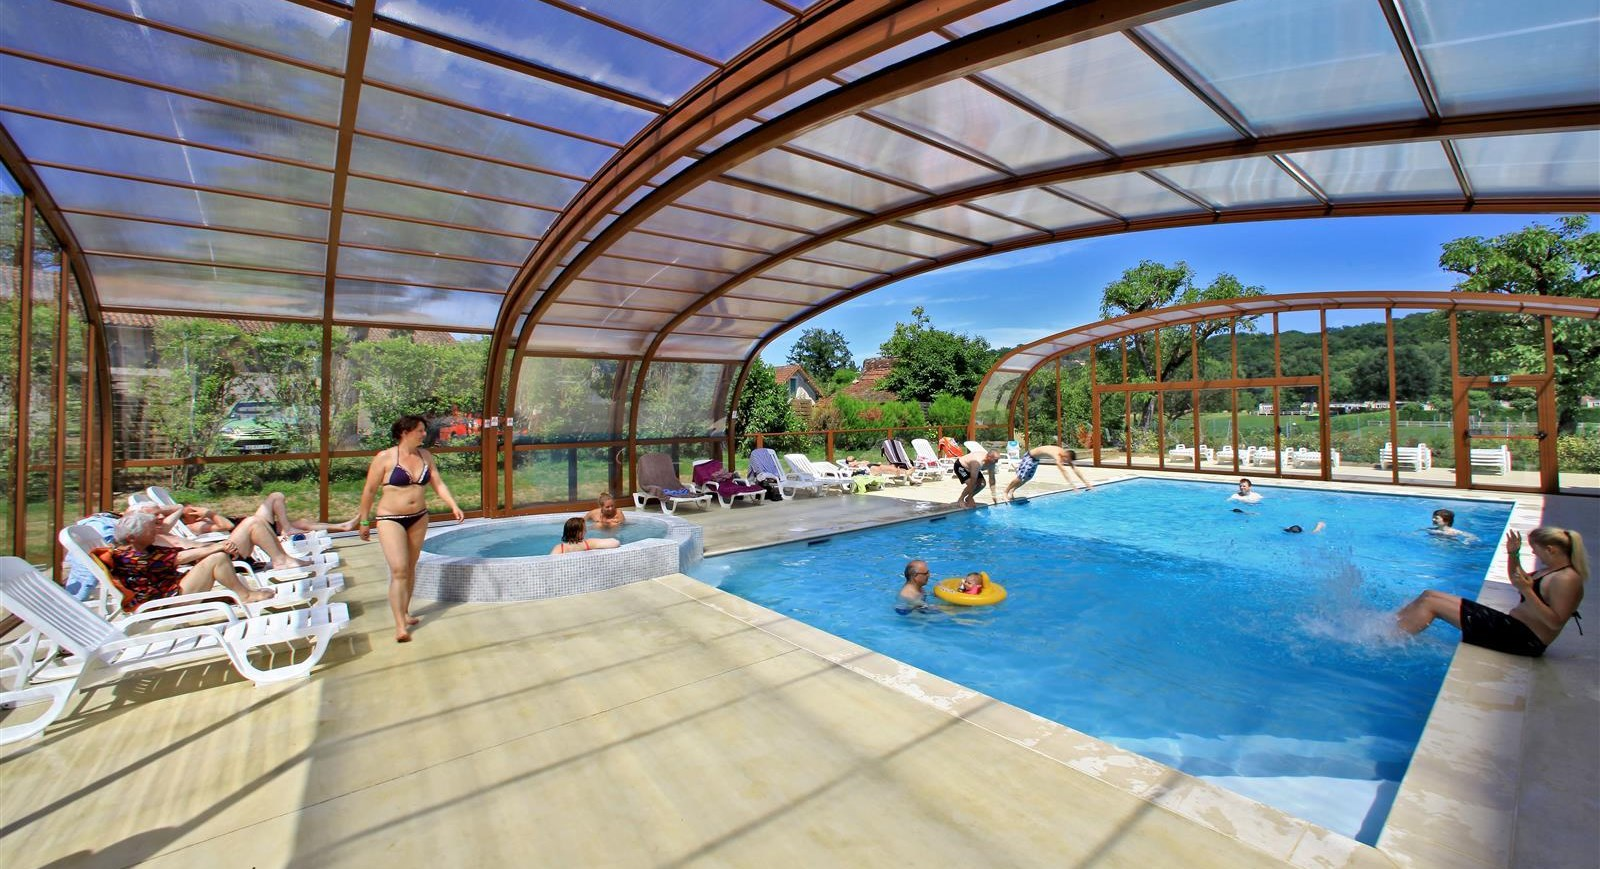 Camping dordogne avec piscine chauff e vos vacances en - Maison vacances dordogne avec piscine ...